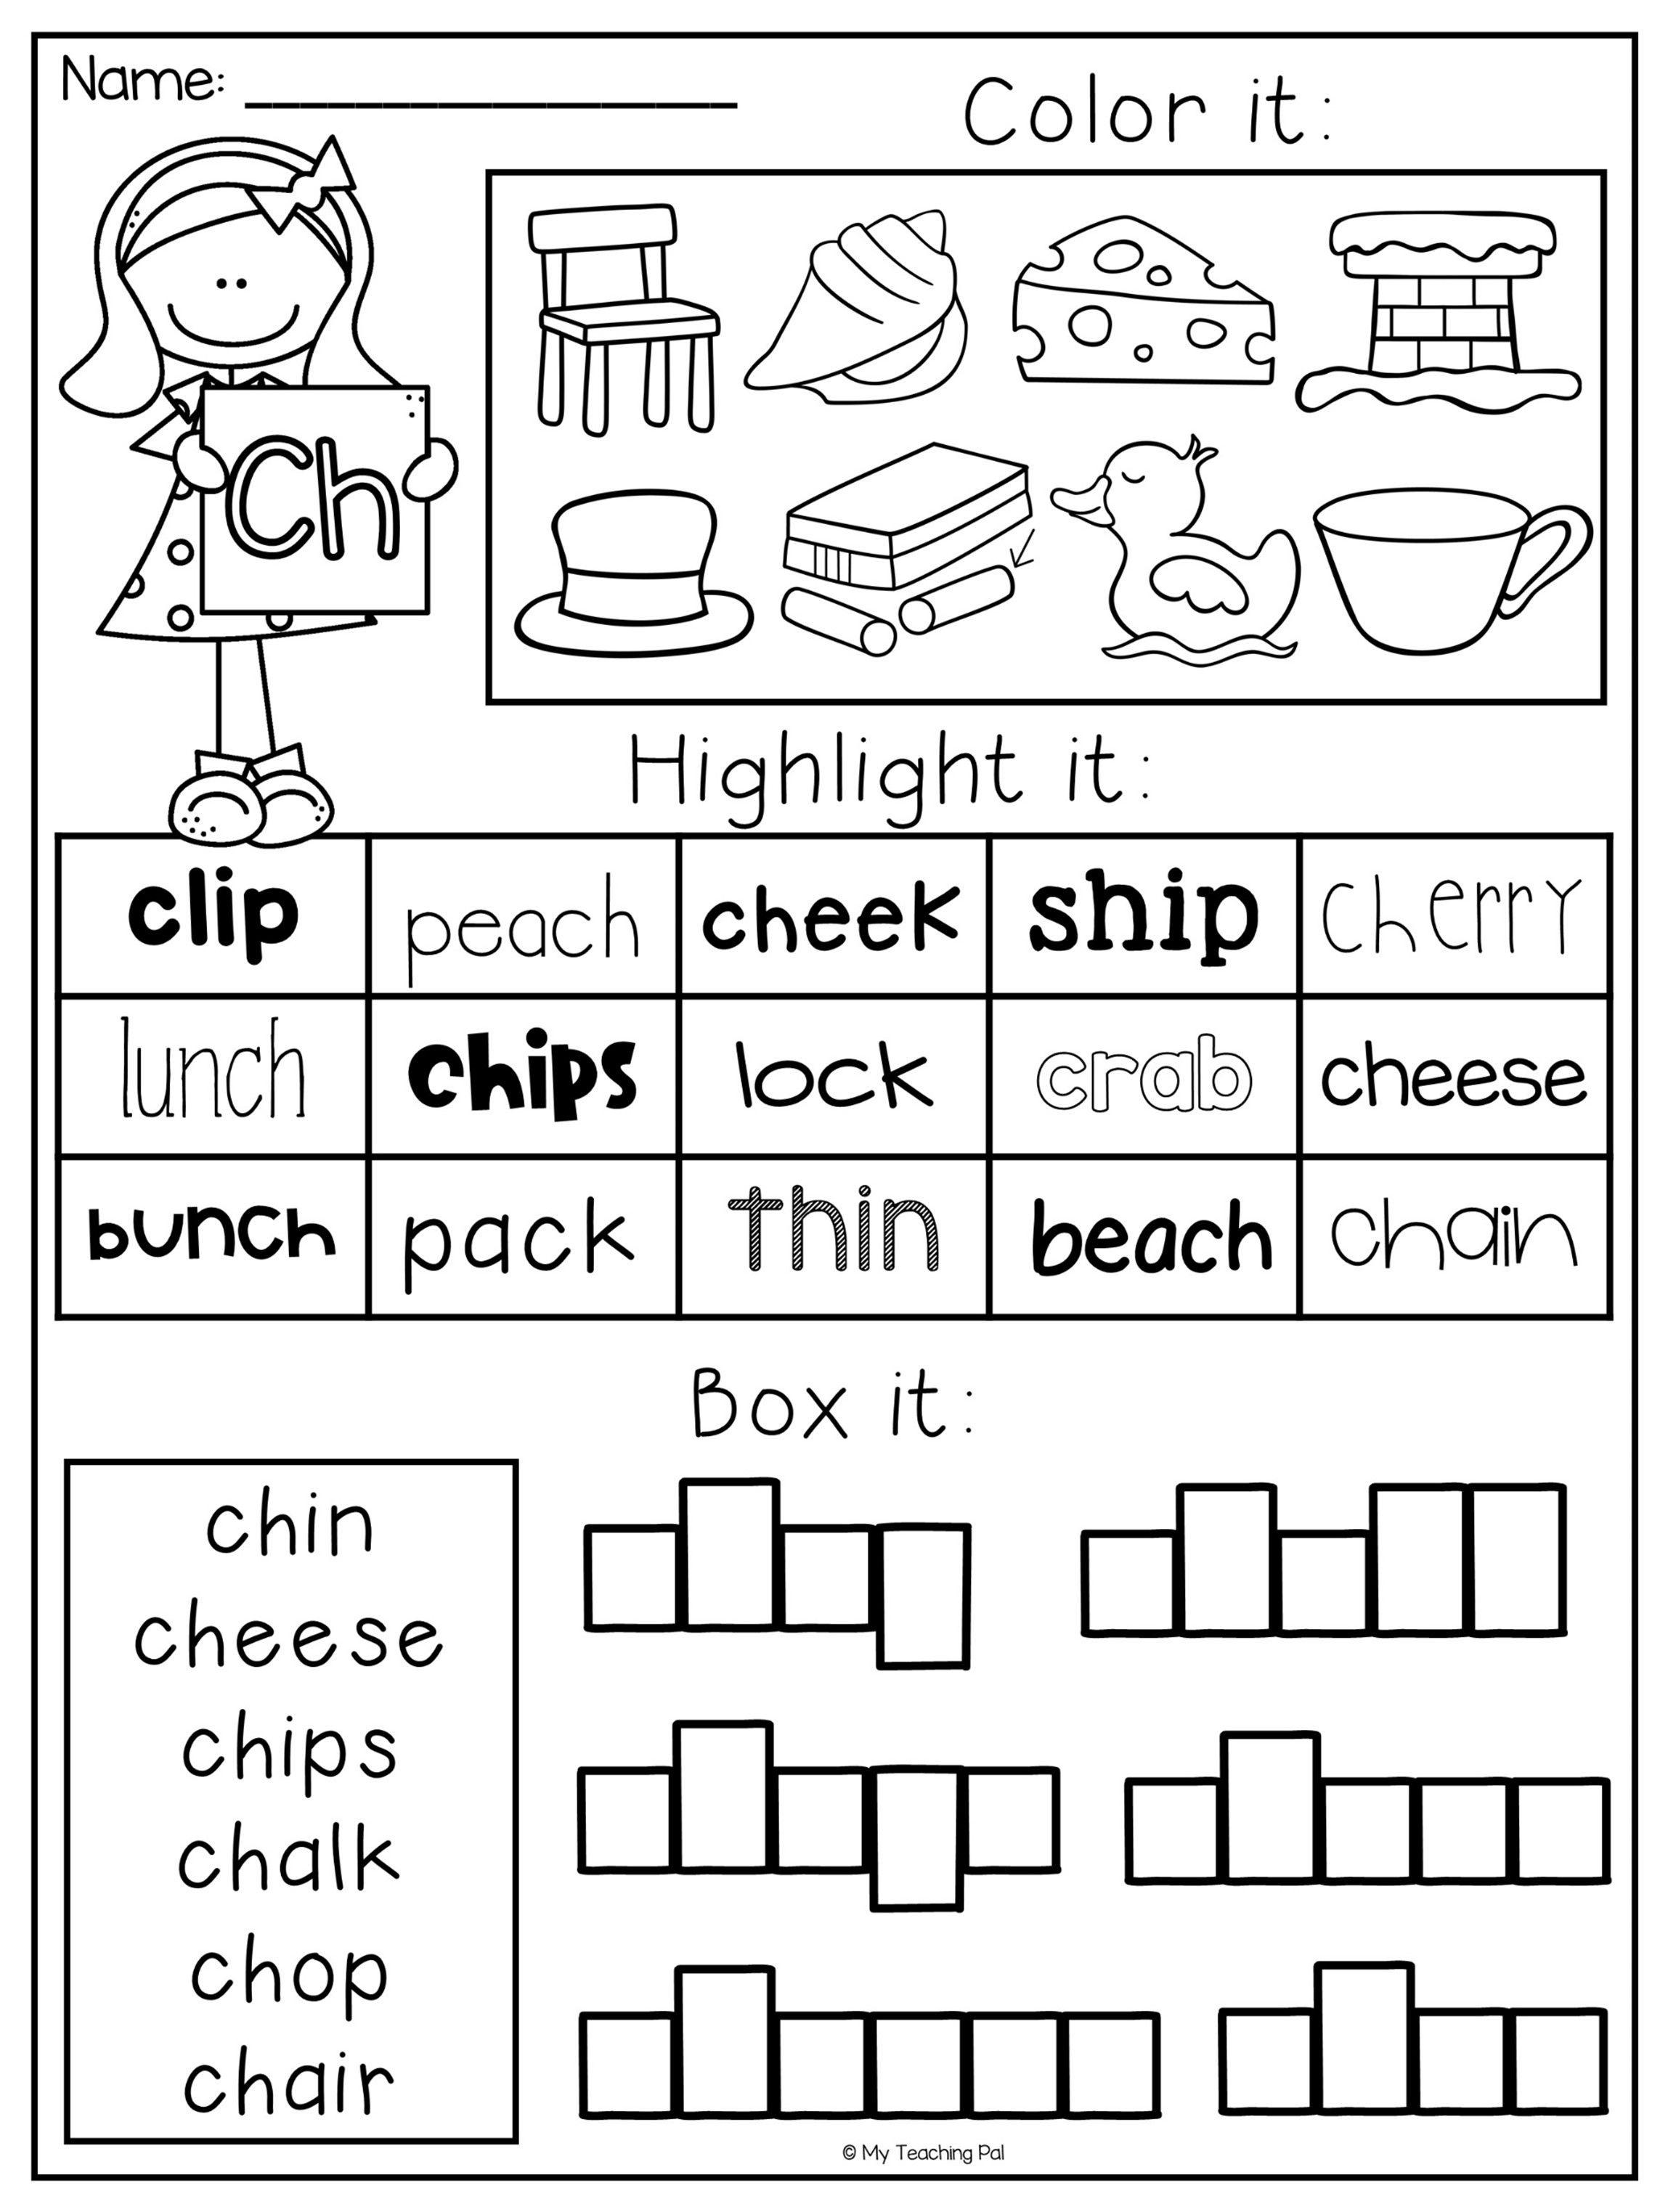 Digraph Worksheet Packet - Ch, Sh, Th, Wh, Ph | Educational | Sh Worksheets Free Printable